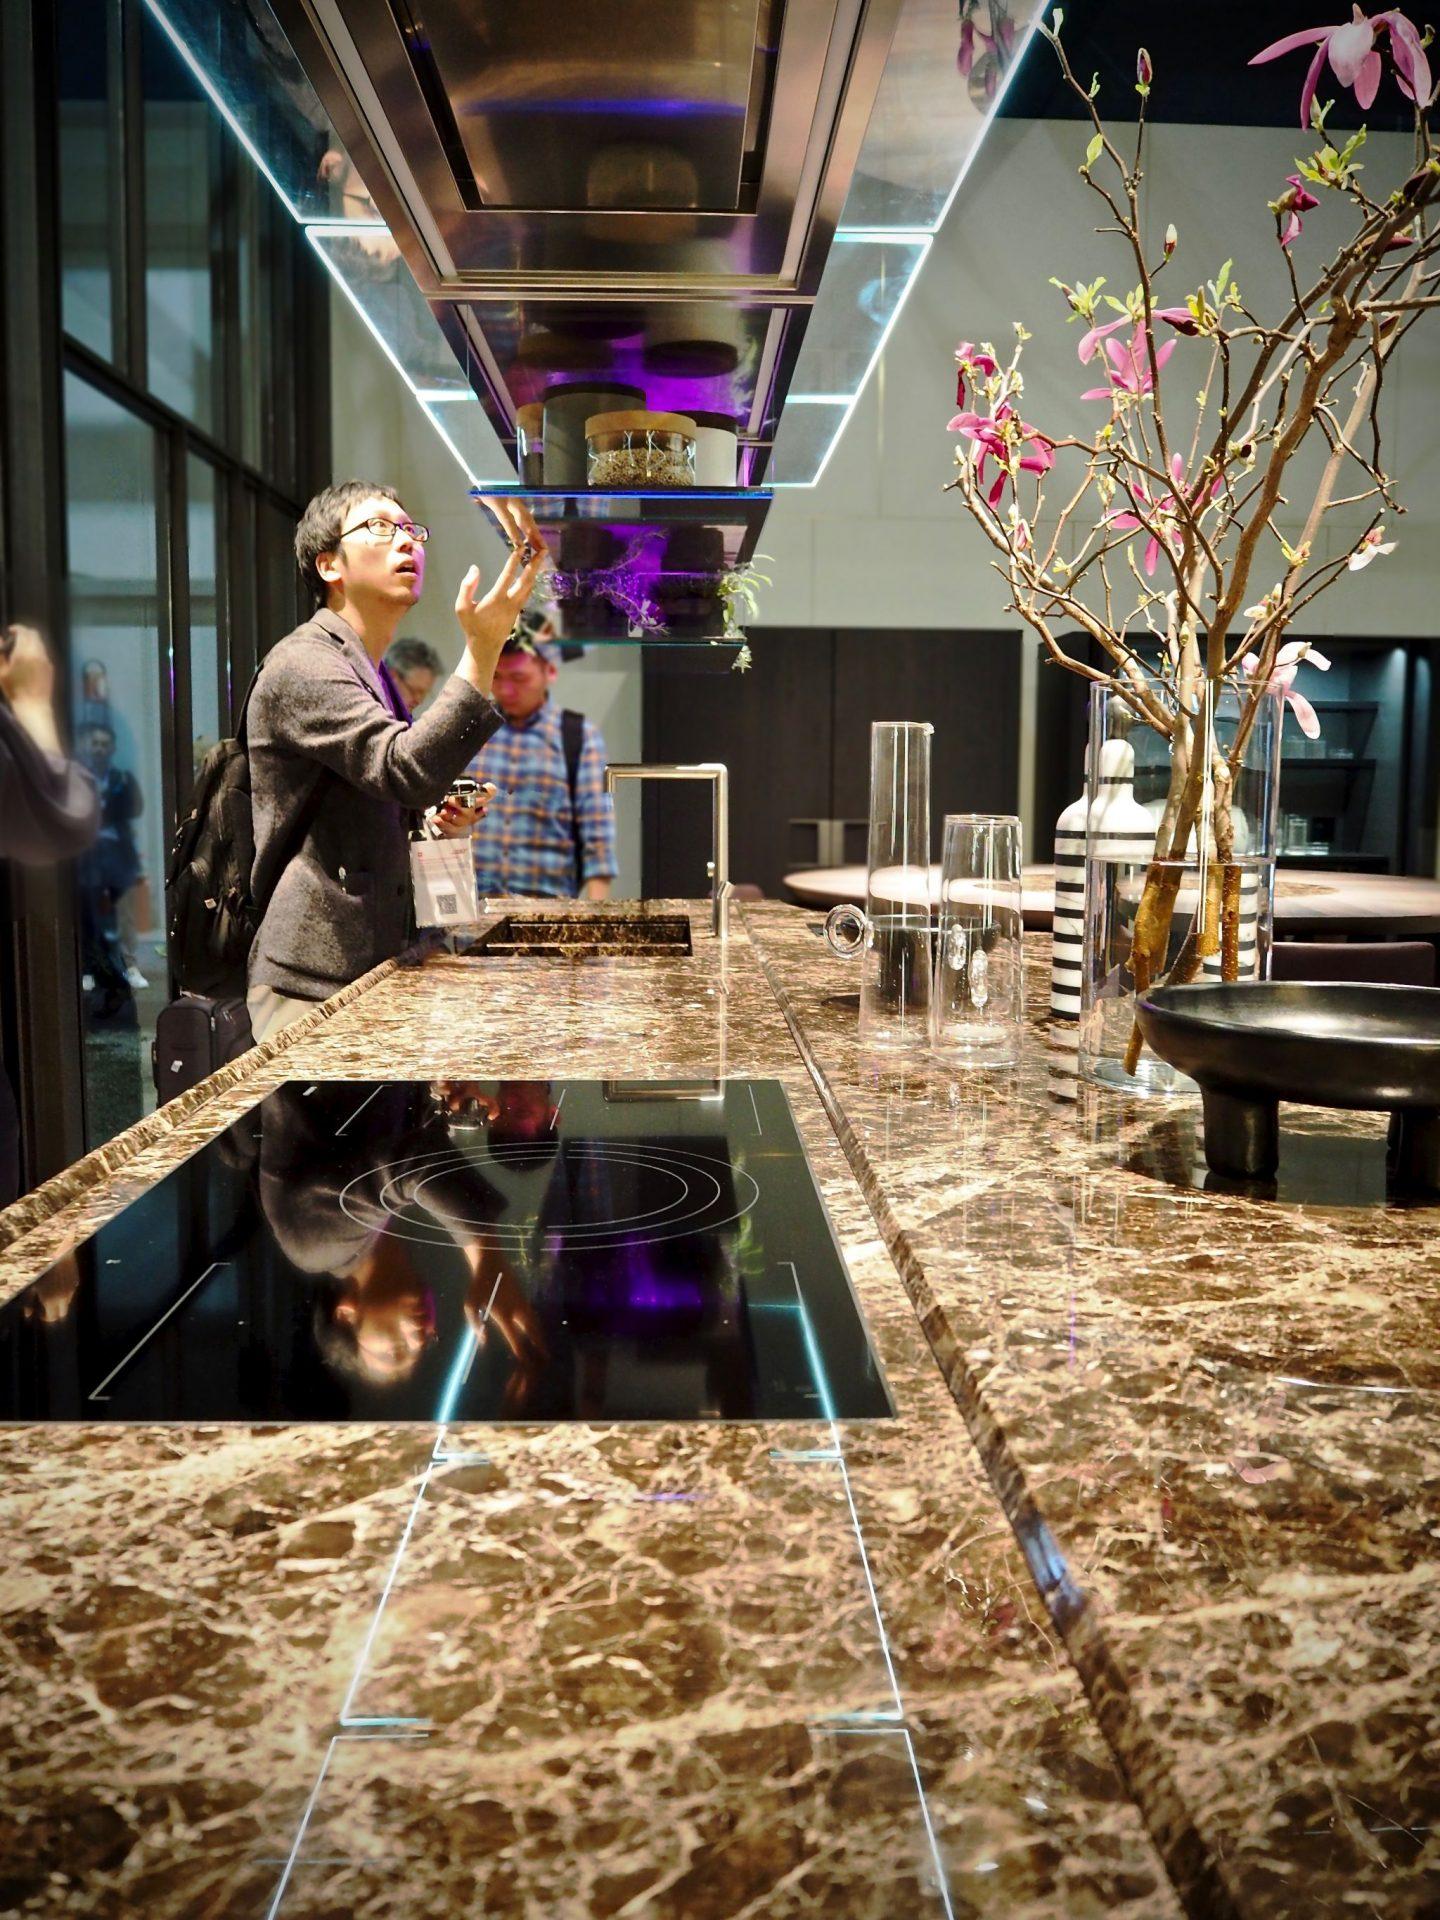 Poliform kitchen, Emperador extra dark marble, highlights from Salone del Mobile 2018, via hellopeagreen